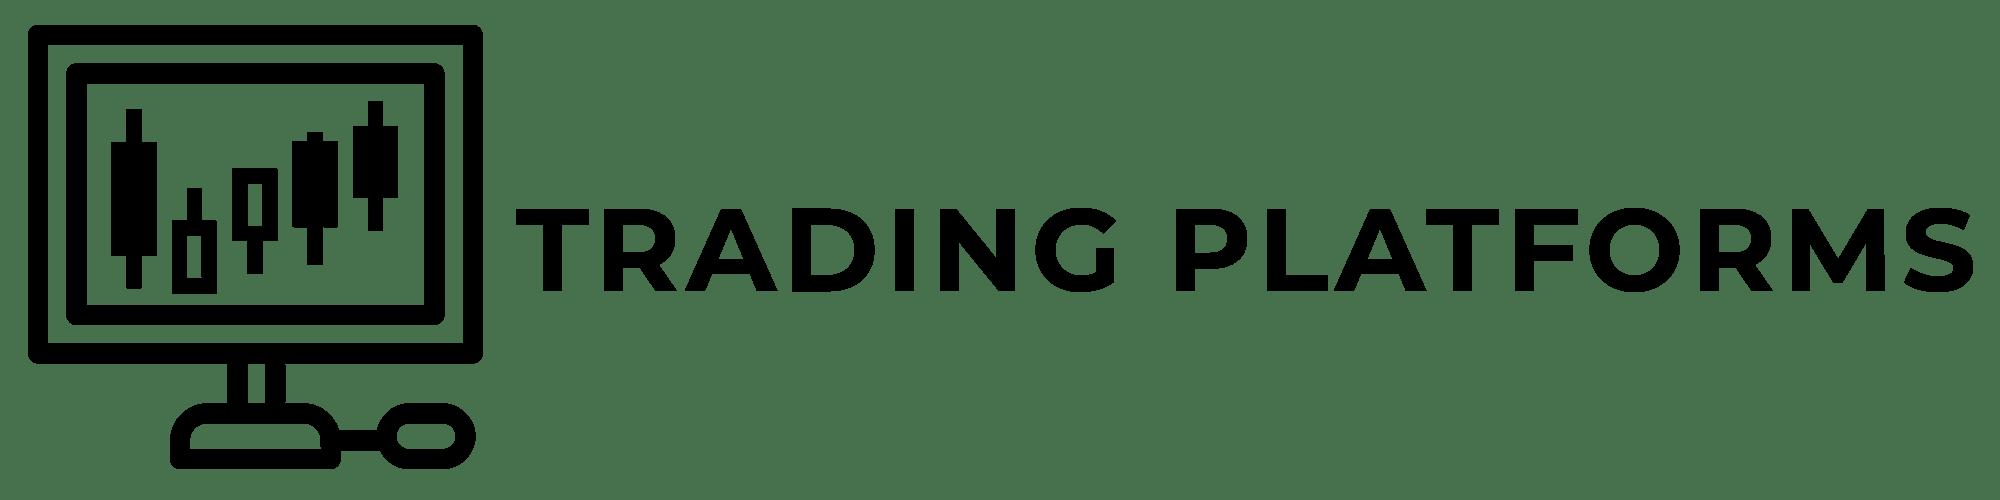 Trading Platforms Menu Nav Image V2